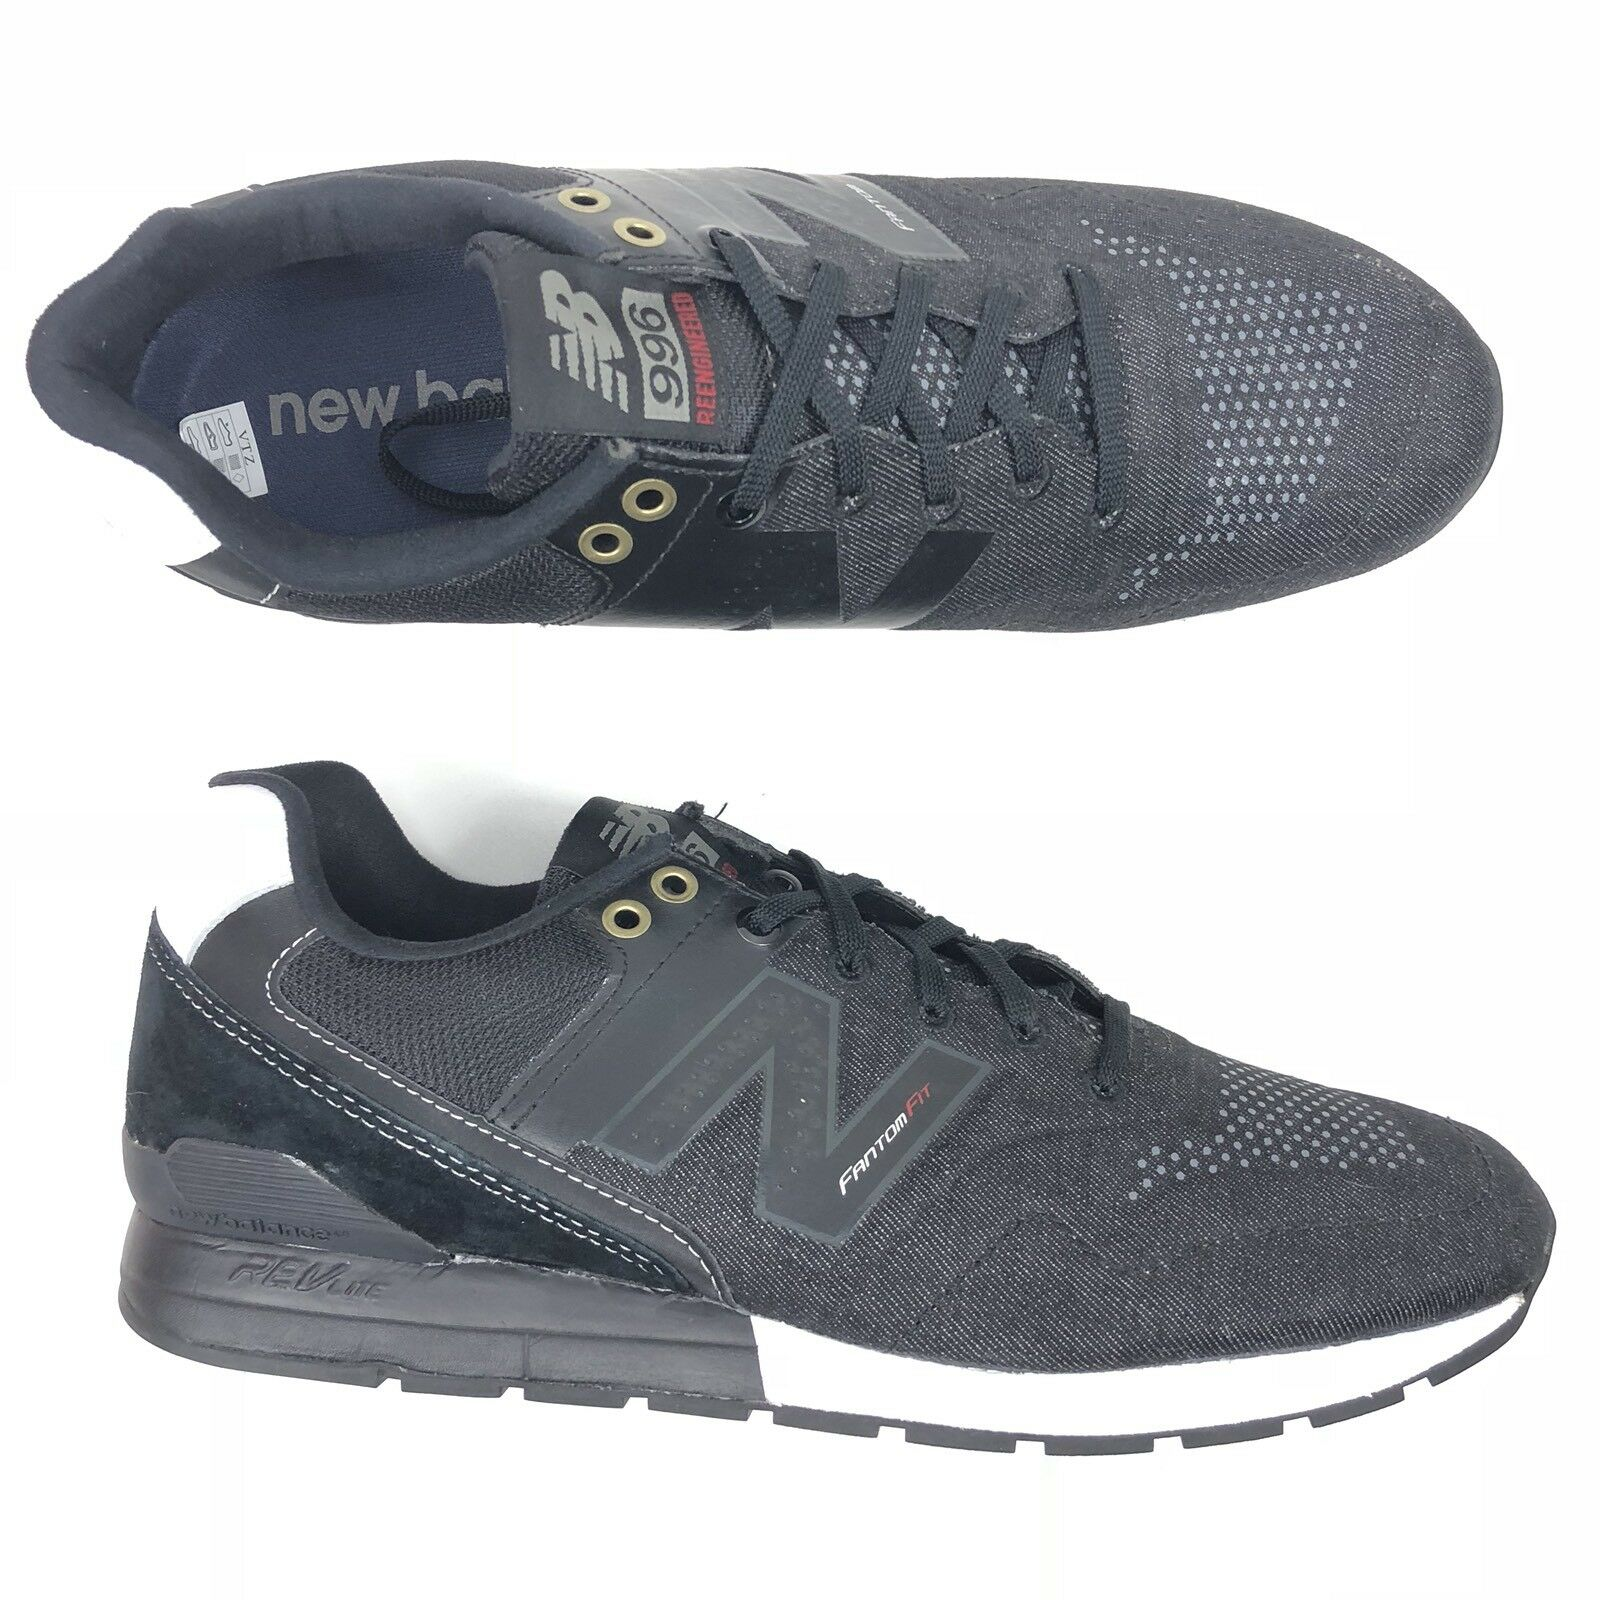 New Balance Mens 996 ReEngineered Fantom Fit Running Shoes MRL996FS Size 10